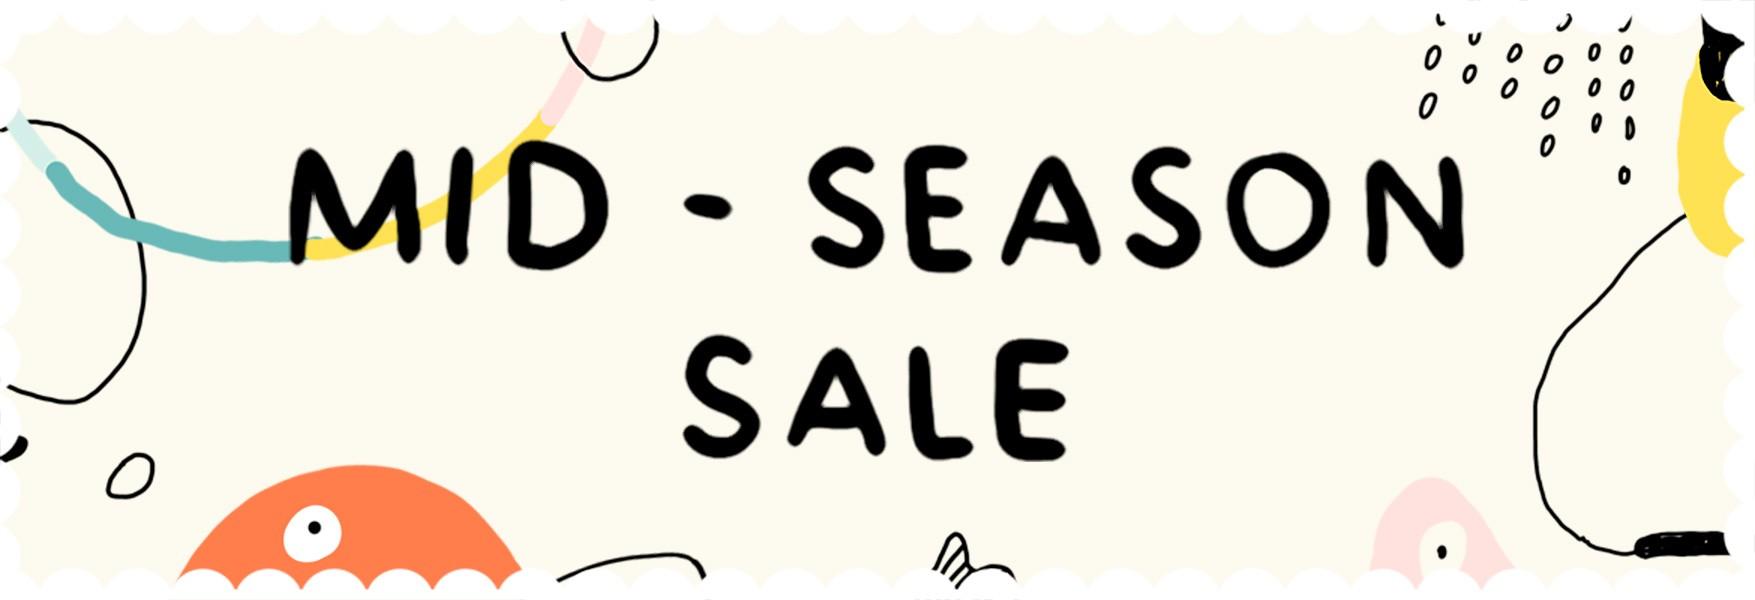 Mis season sale